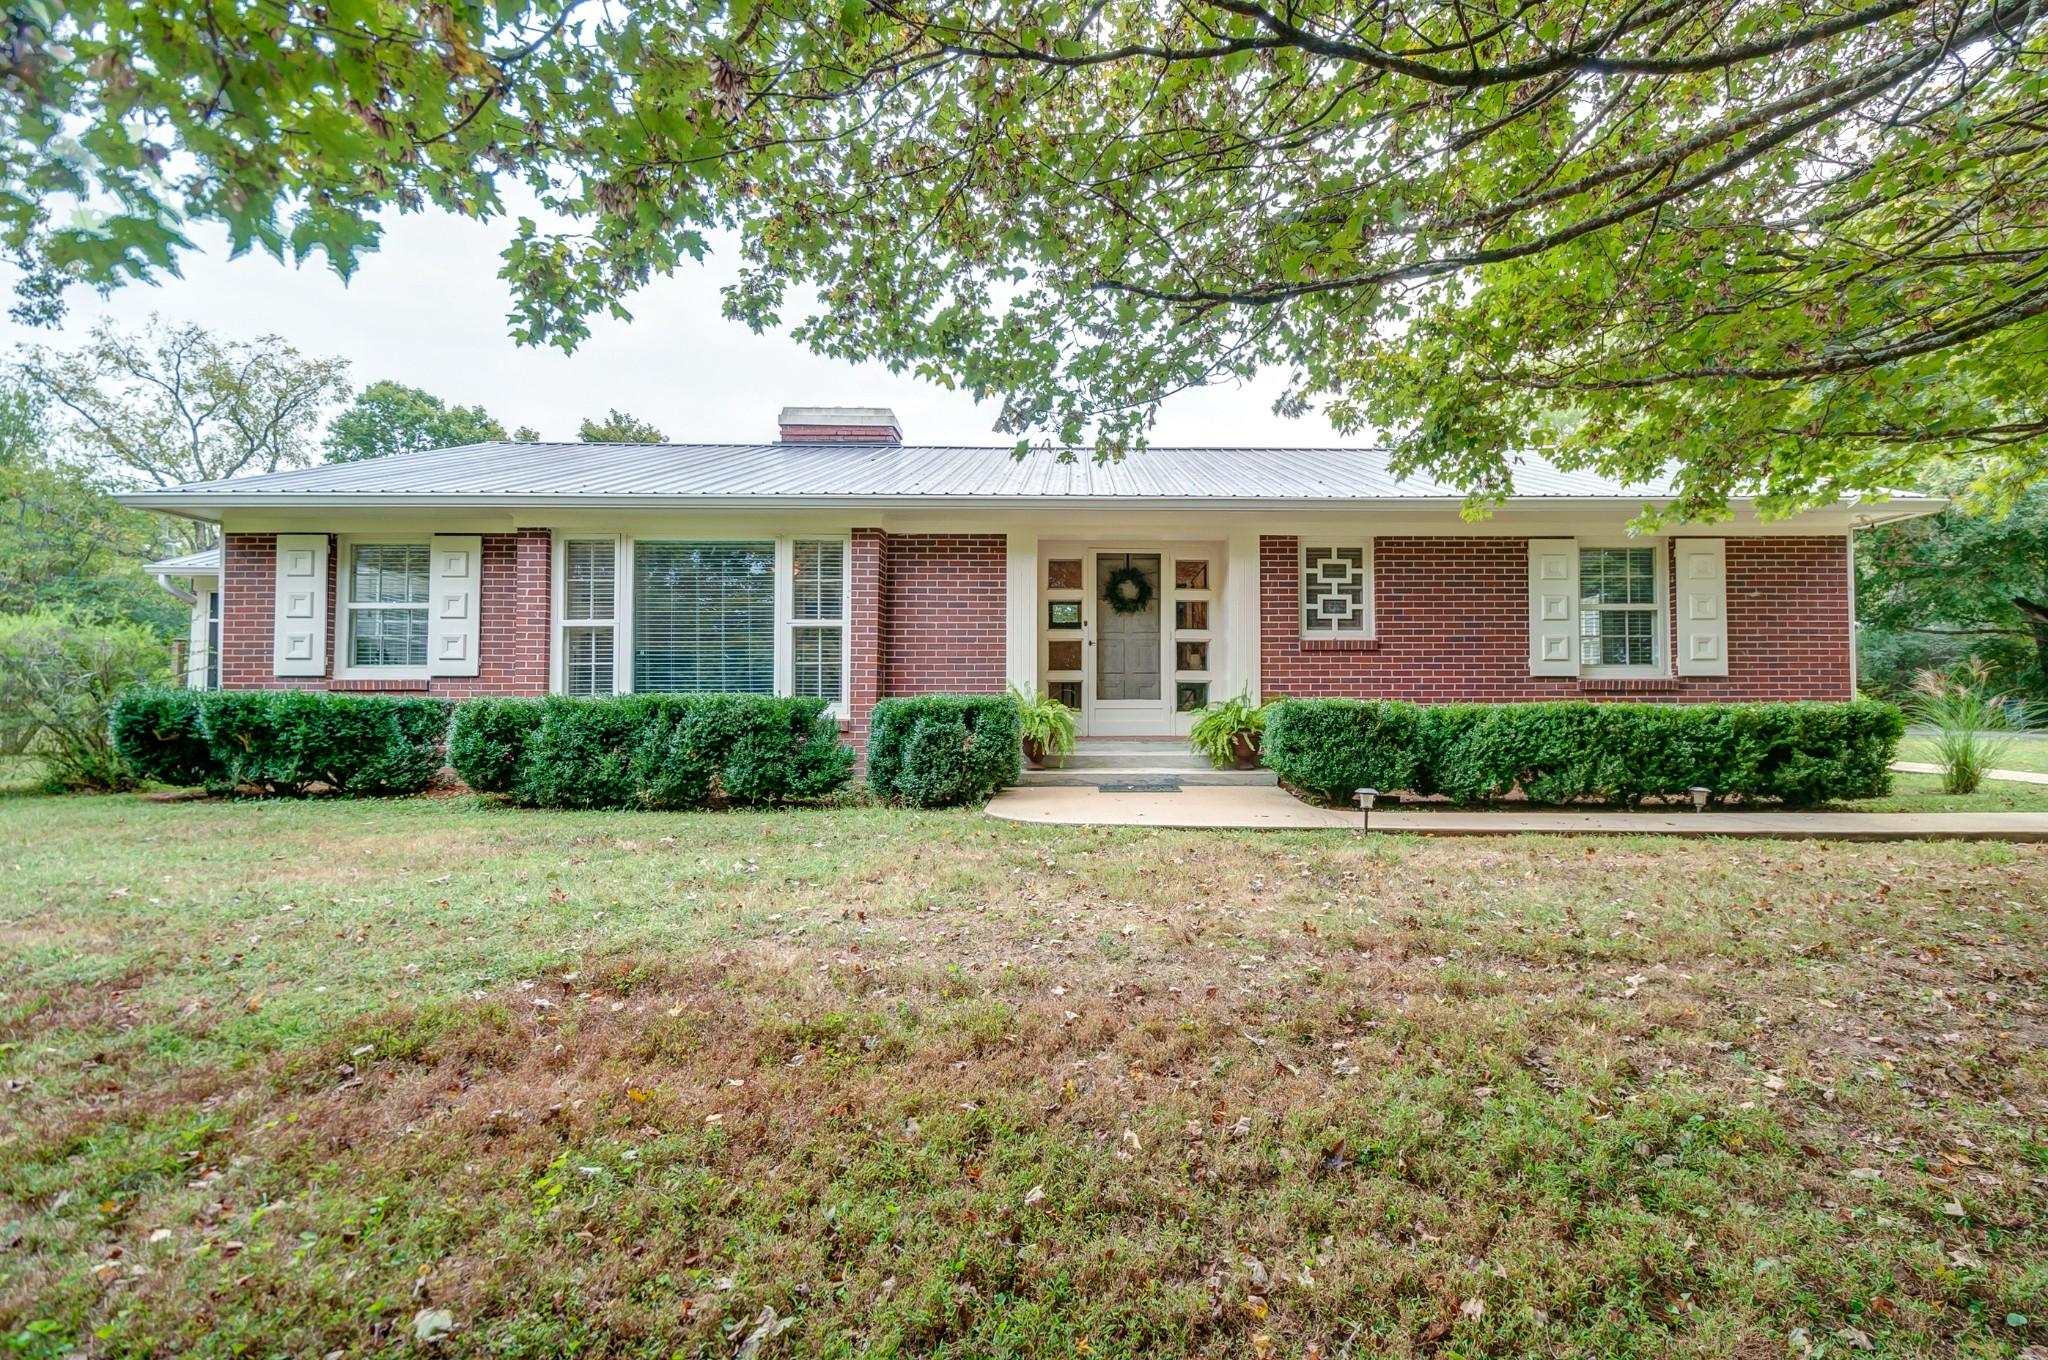 104 E Over Dr, Centerville, TN 37033 - Centerville, TN real estate listing